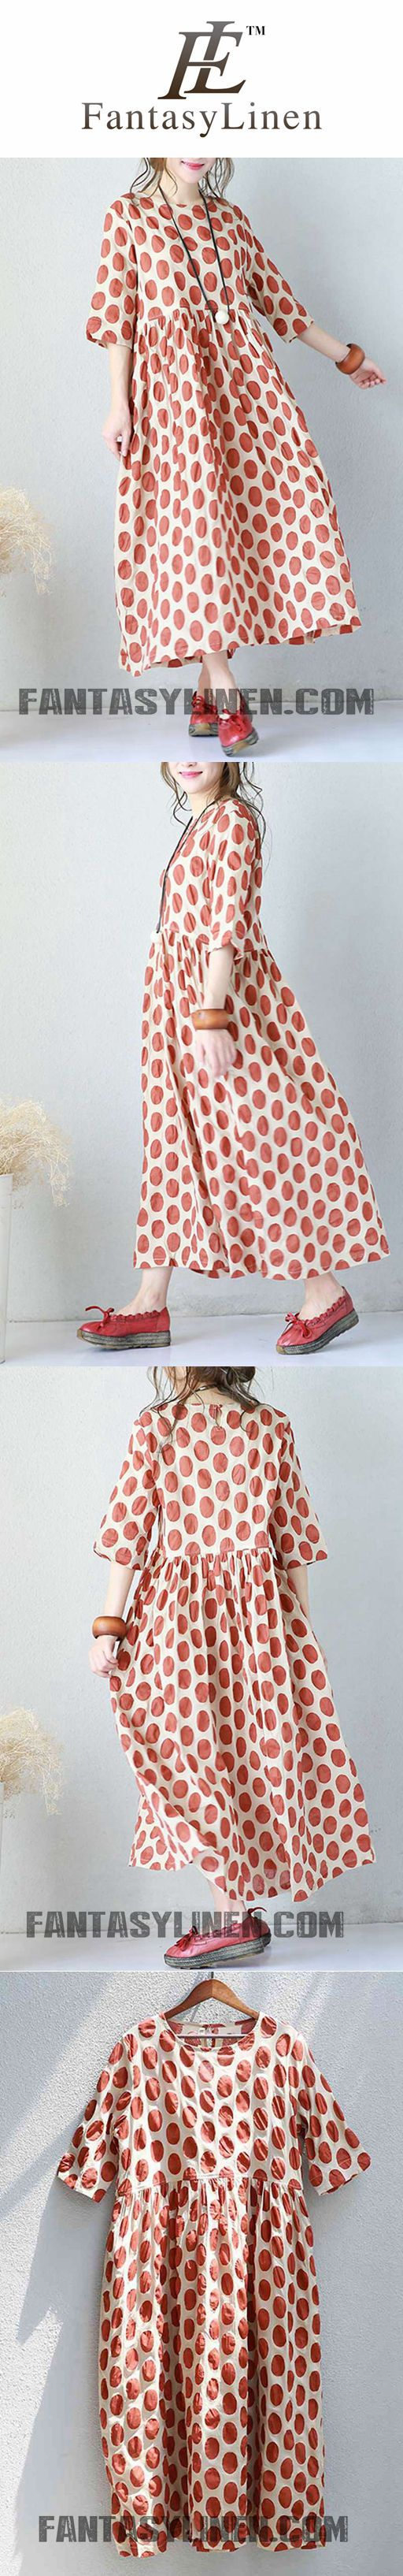 def982f9faf ART COTTON BIG POINTS WOMEN DRESSES SUMMER LOOSE DRESSES FOR WOMEN Q670